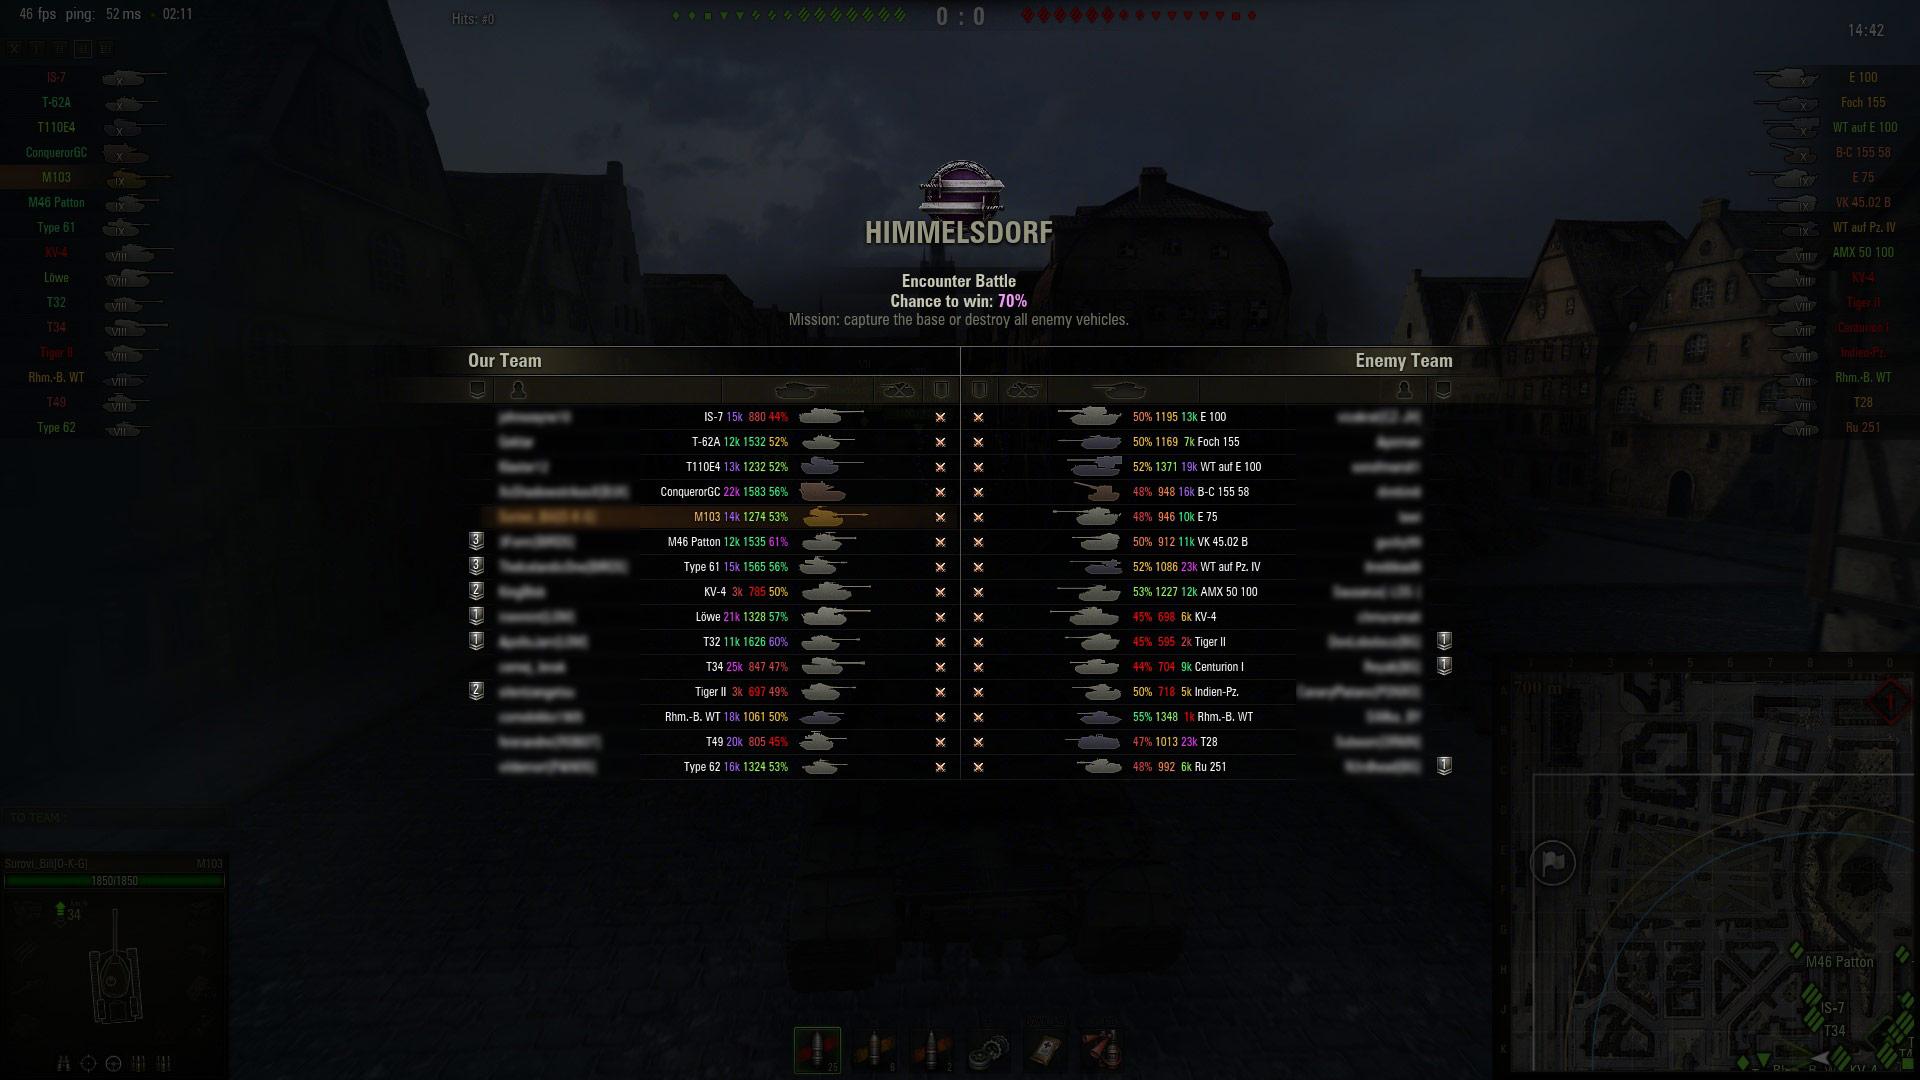 World of tanks stupid matchmaking